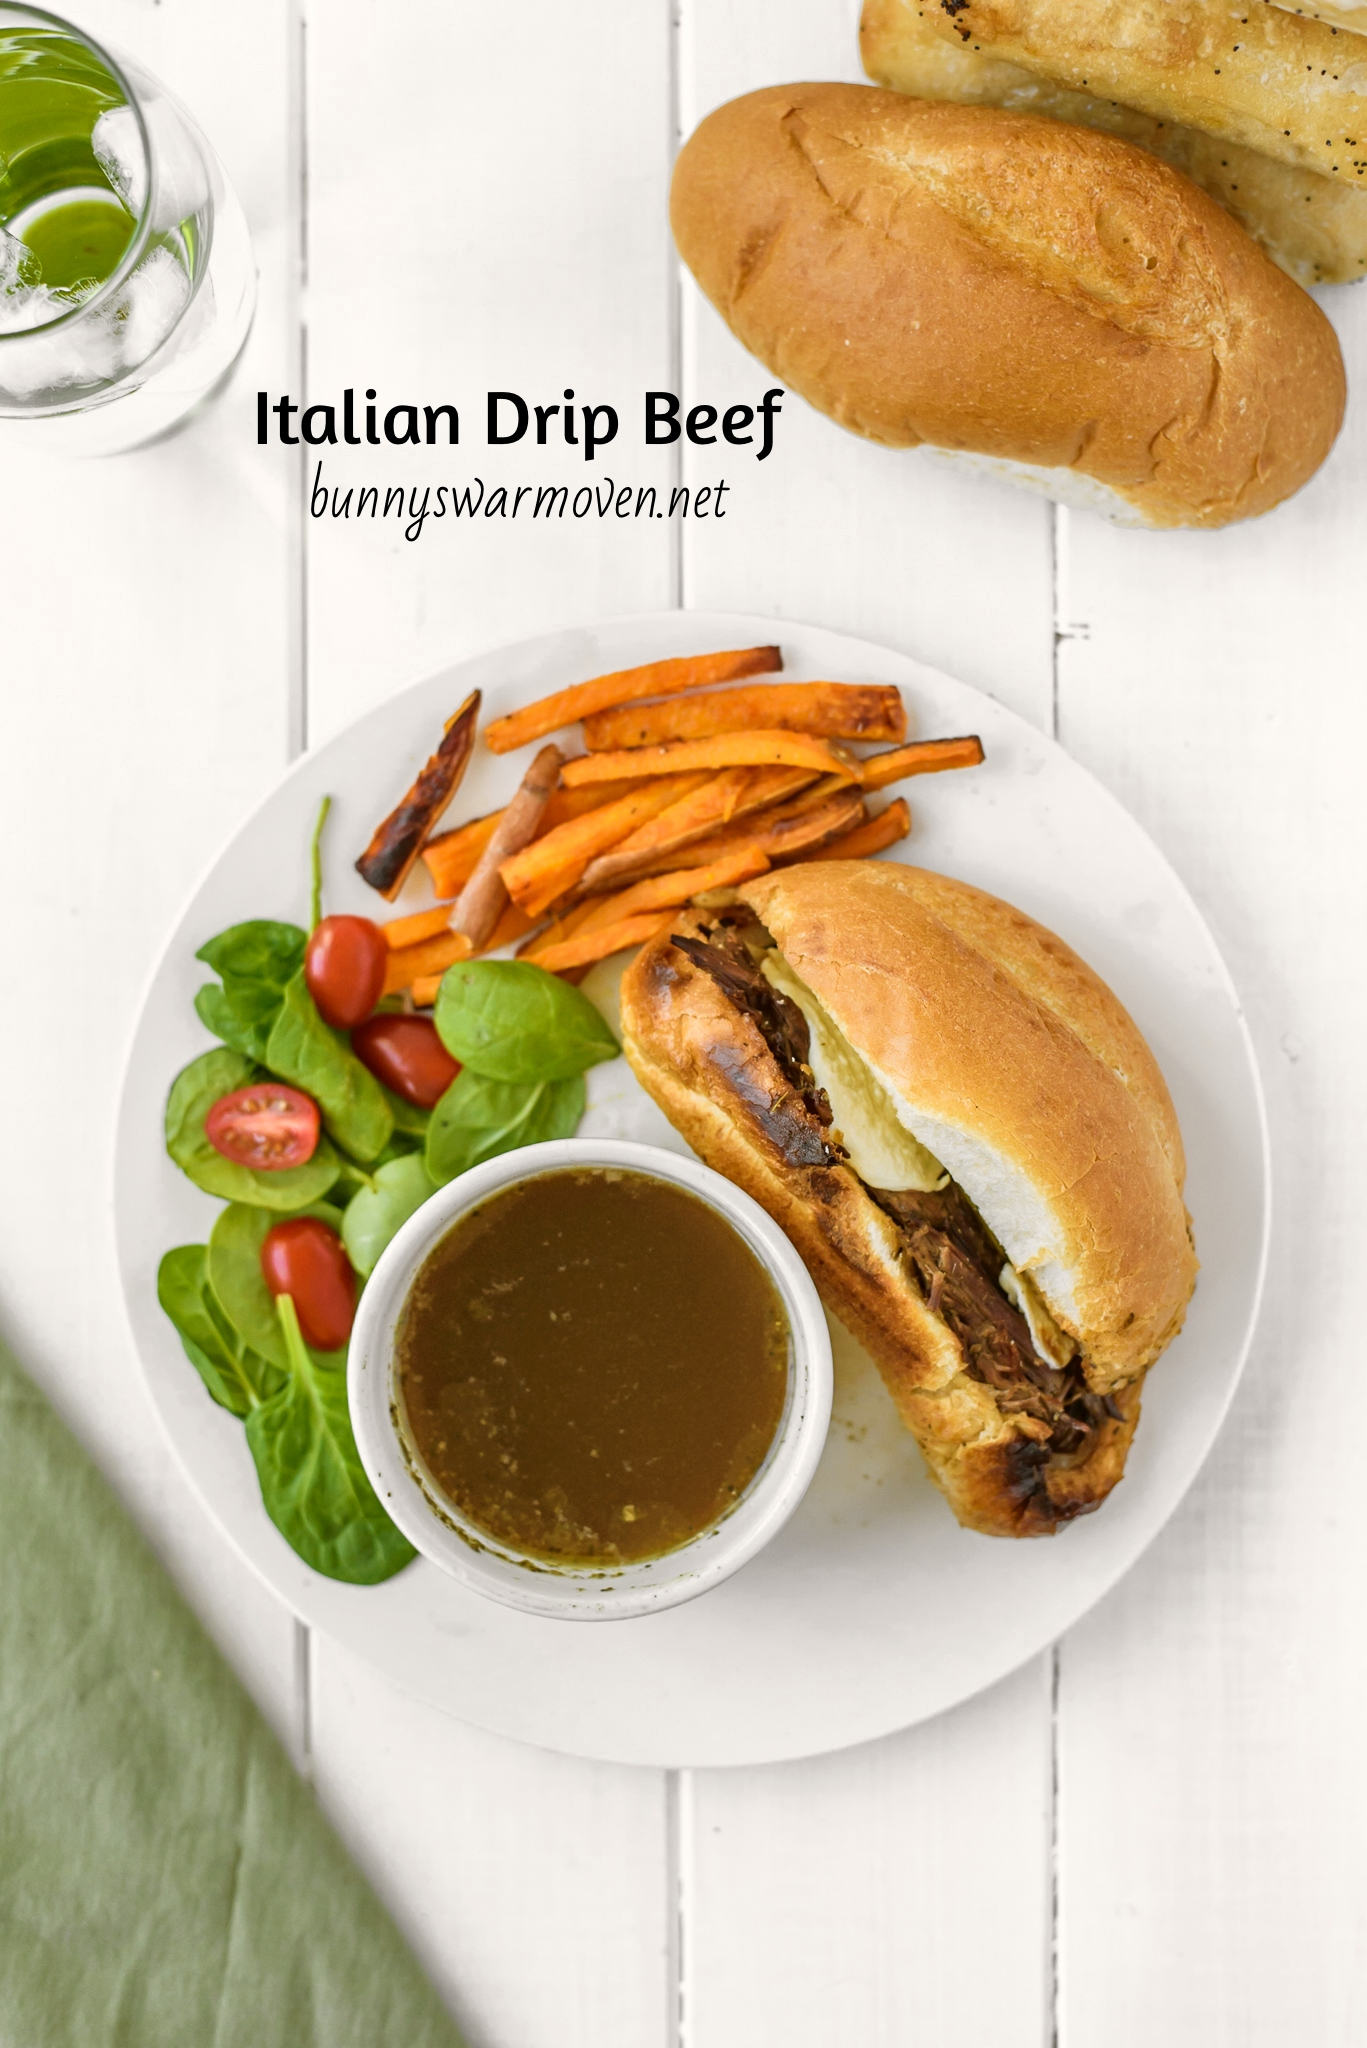 Pioneer Woman's Italian Drip Beef